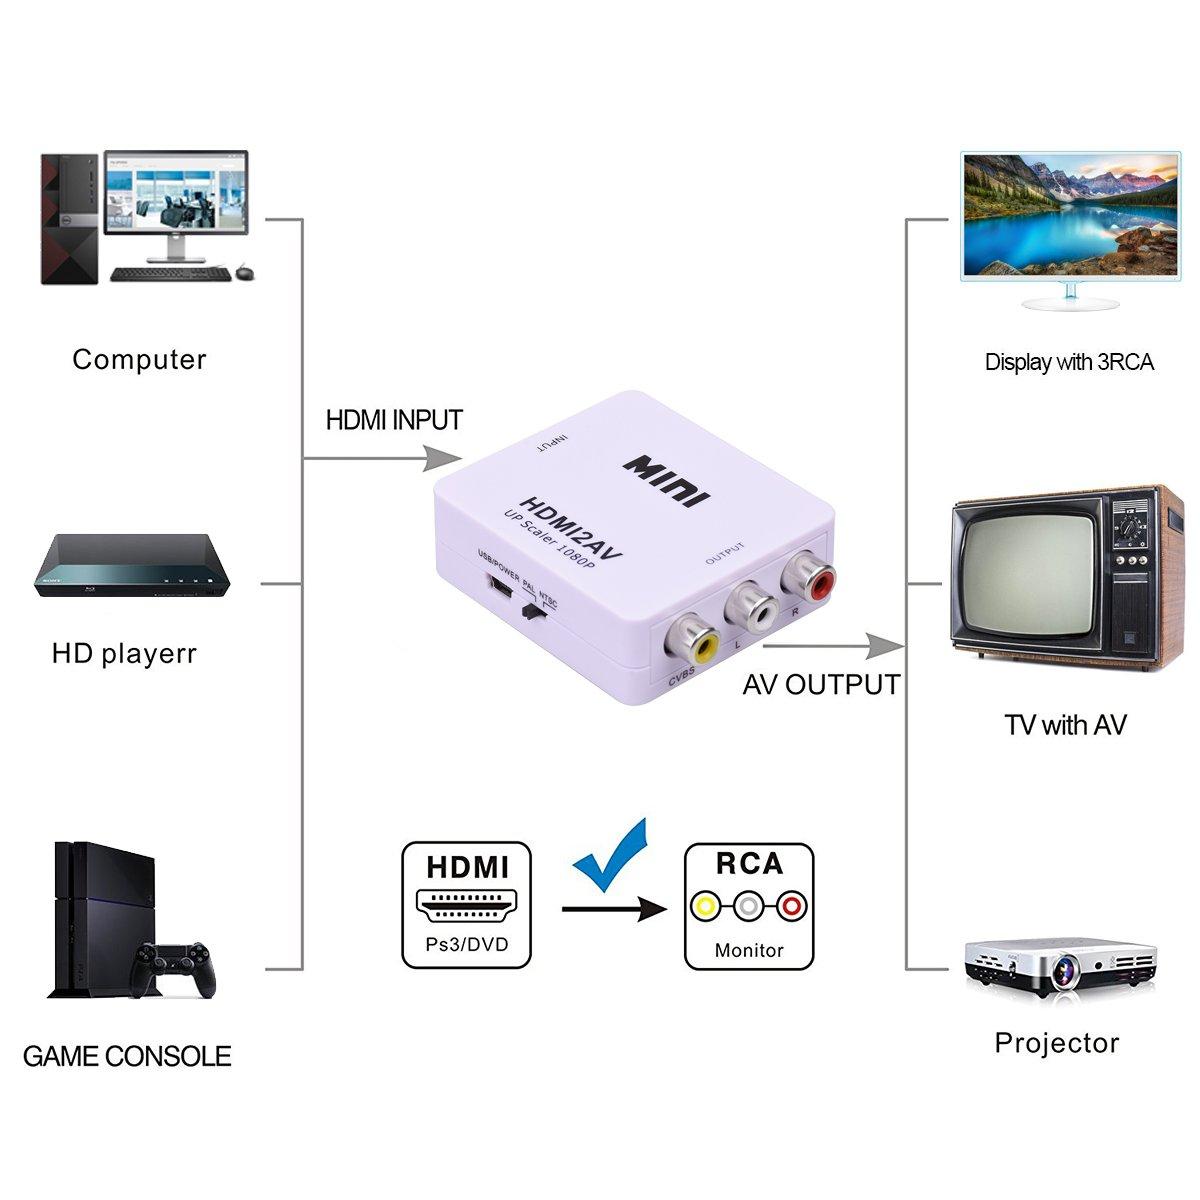 Wonlyus HDMI to RCA, HDMI to AV,1080P HDMI to 3RCA CVBs Composite Video Audio Converter Adapter Supports PAL/NTSC for Amazon Fire TV Stick, Roku, Chromecast, Apple TV, PC, Laptop, Xbox, HDTV, DVD